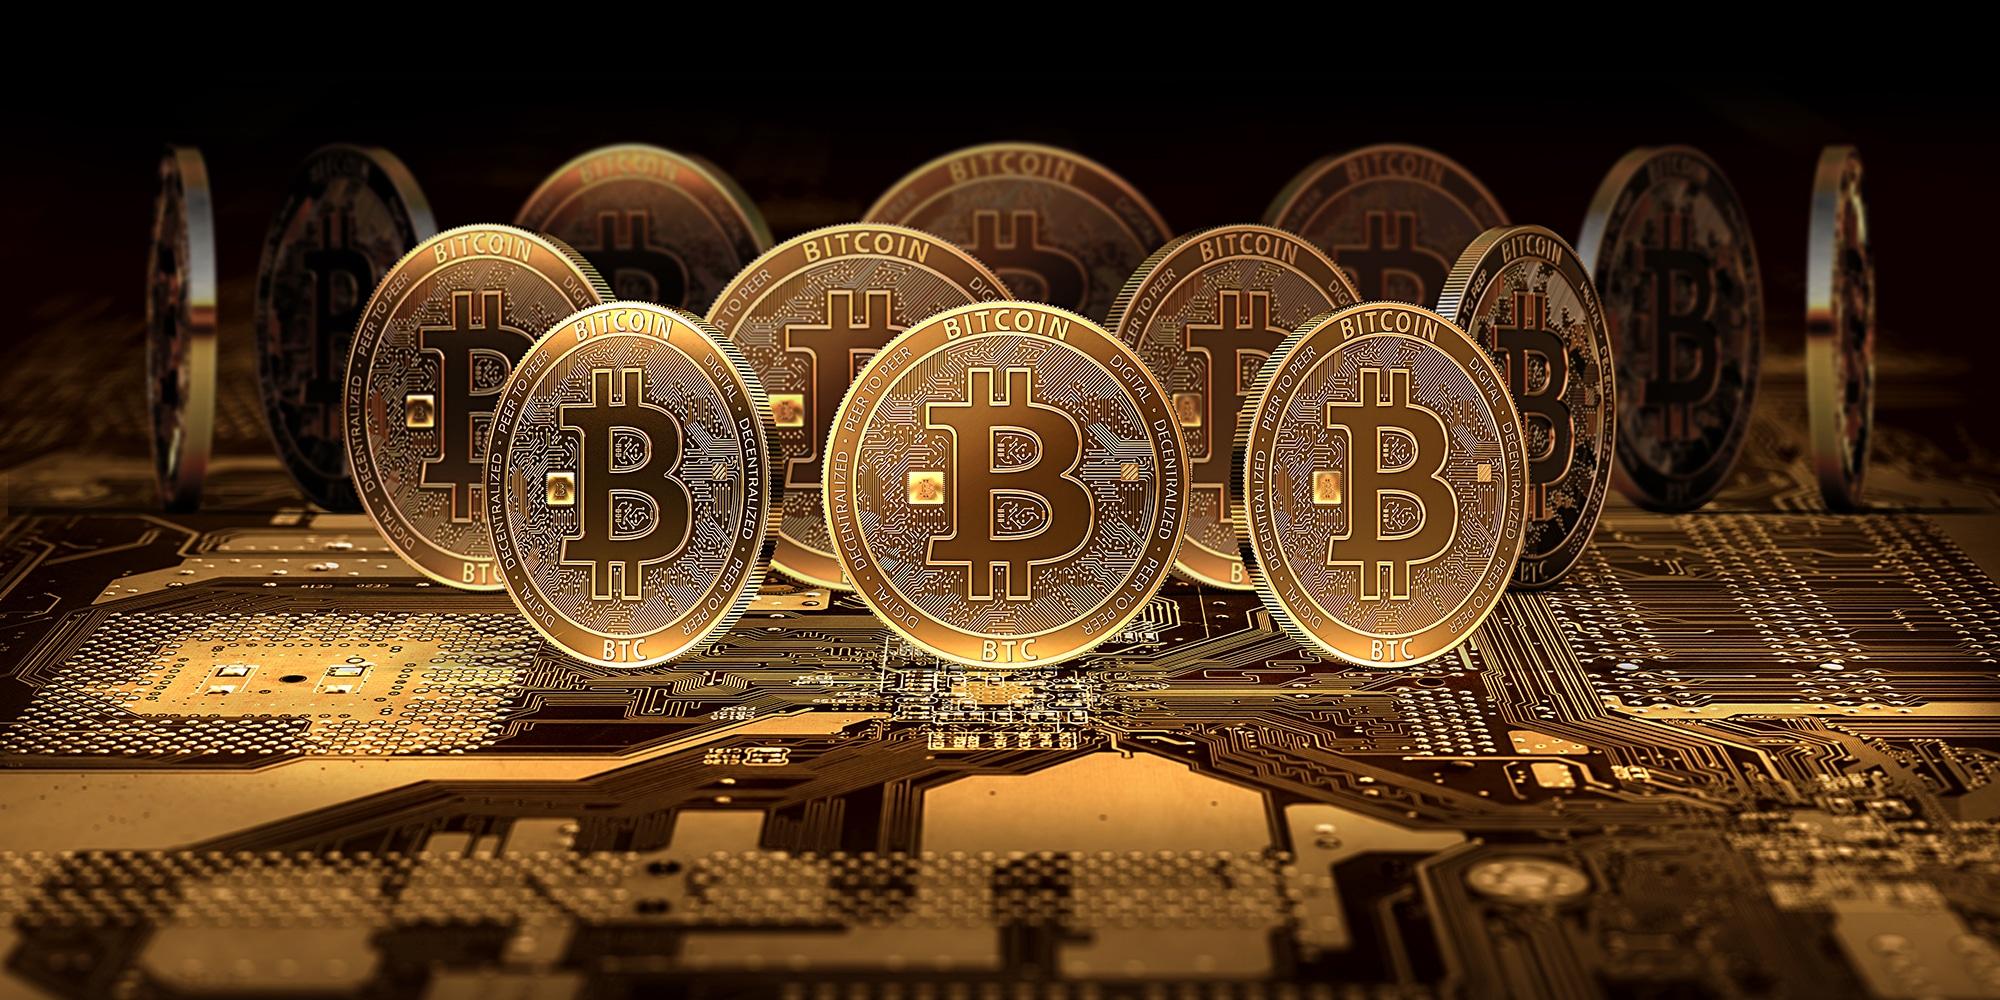 Progress on the Bitcoin card development